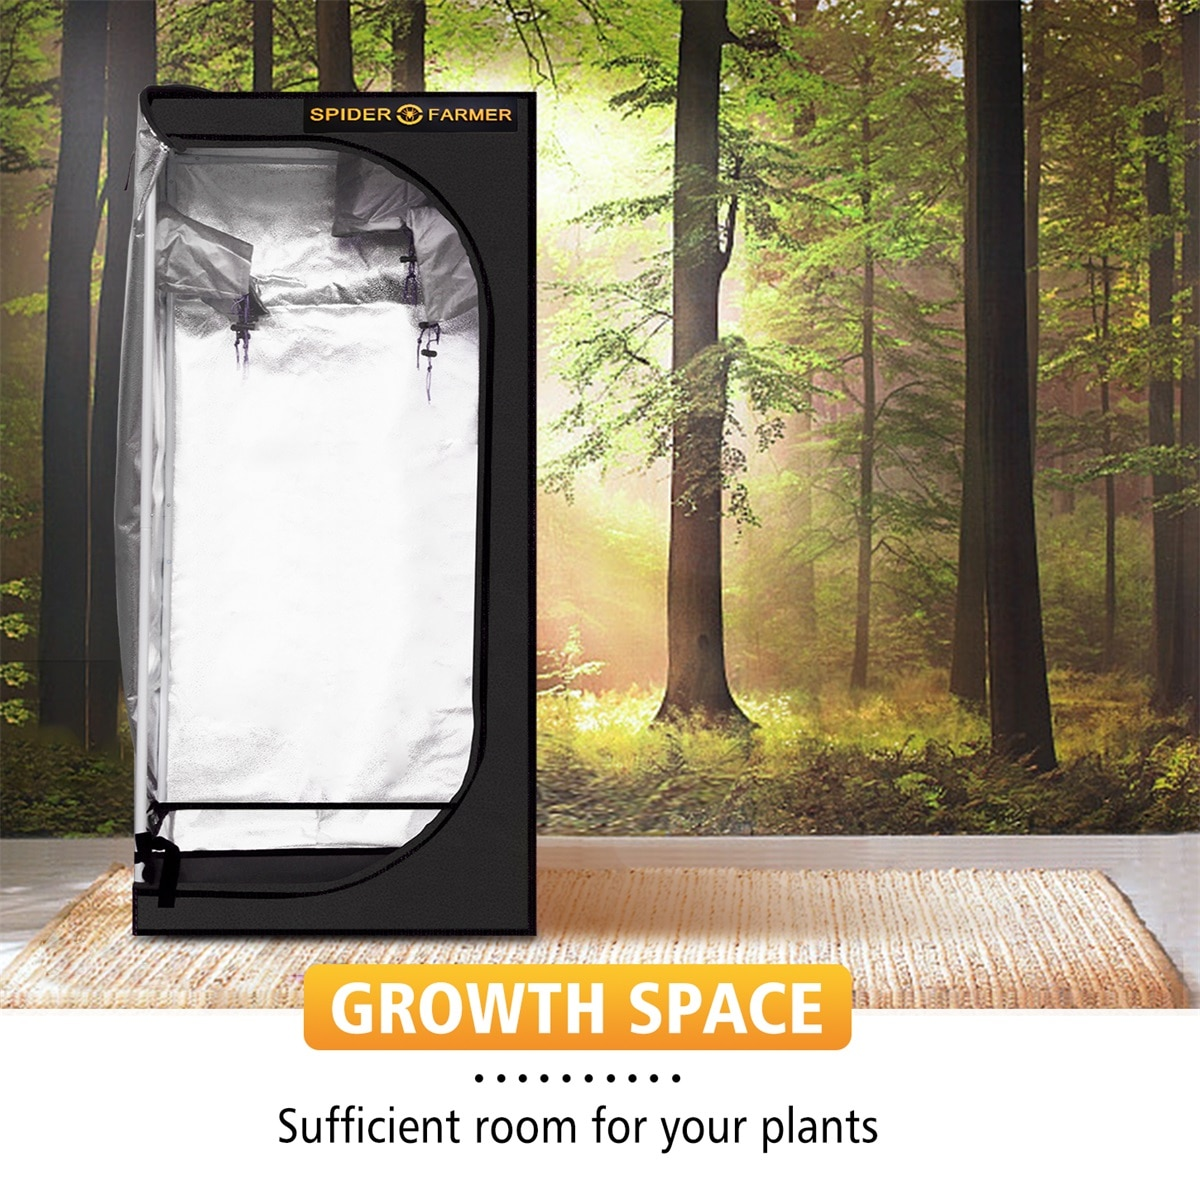 Spider Farmer 90x90x180cm Grow Tent For Led Grow Light, Grow Room Box Plant Growing, Reflective Mylar Non Toxic Garden House enlarge